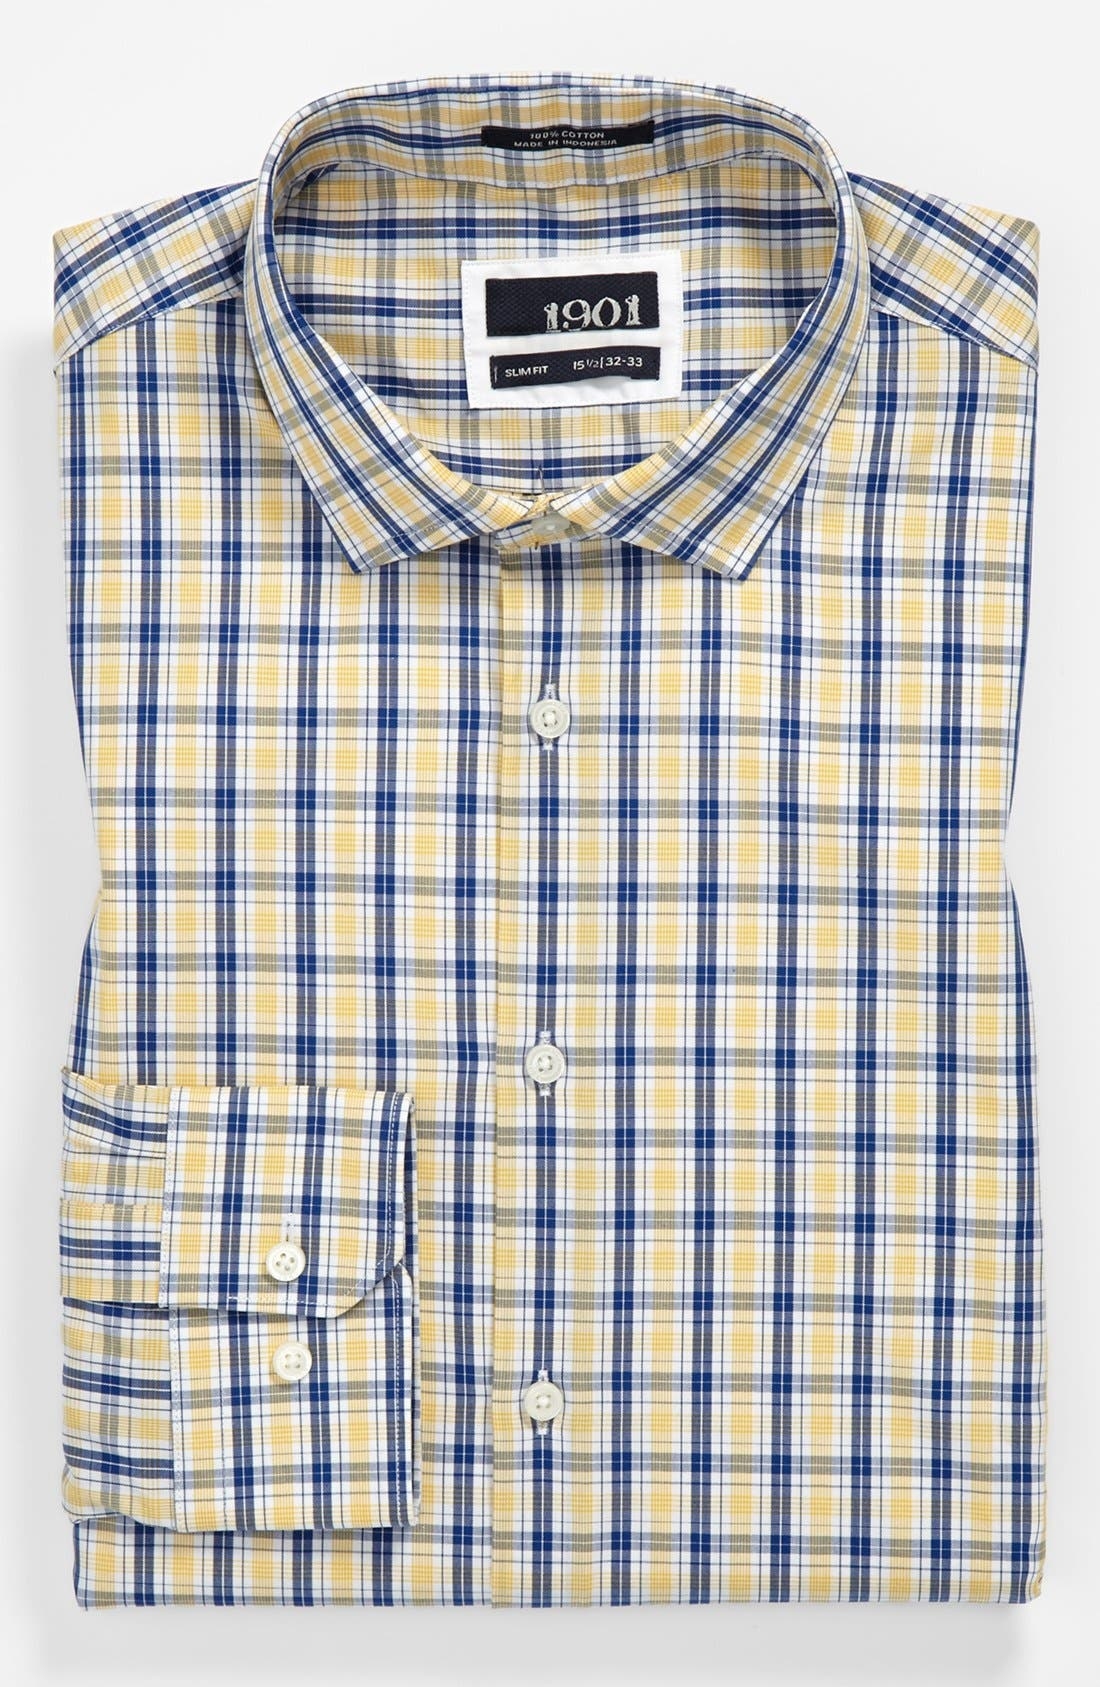 Alternate Image 1 Selected - 1901 Slim Fit Plaid Dress Shirt